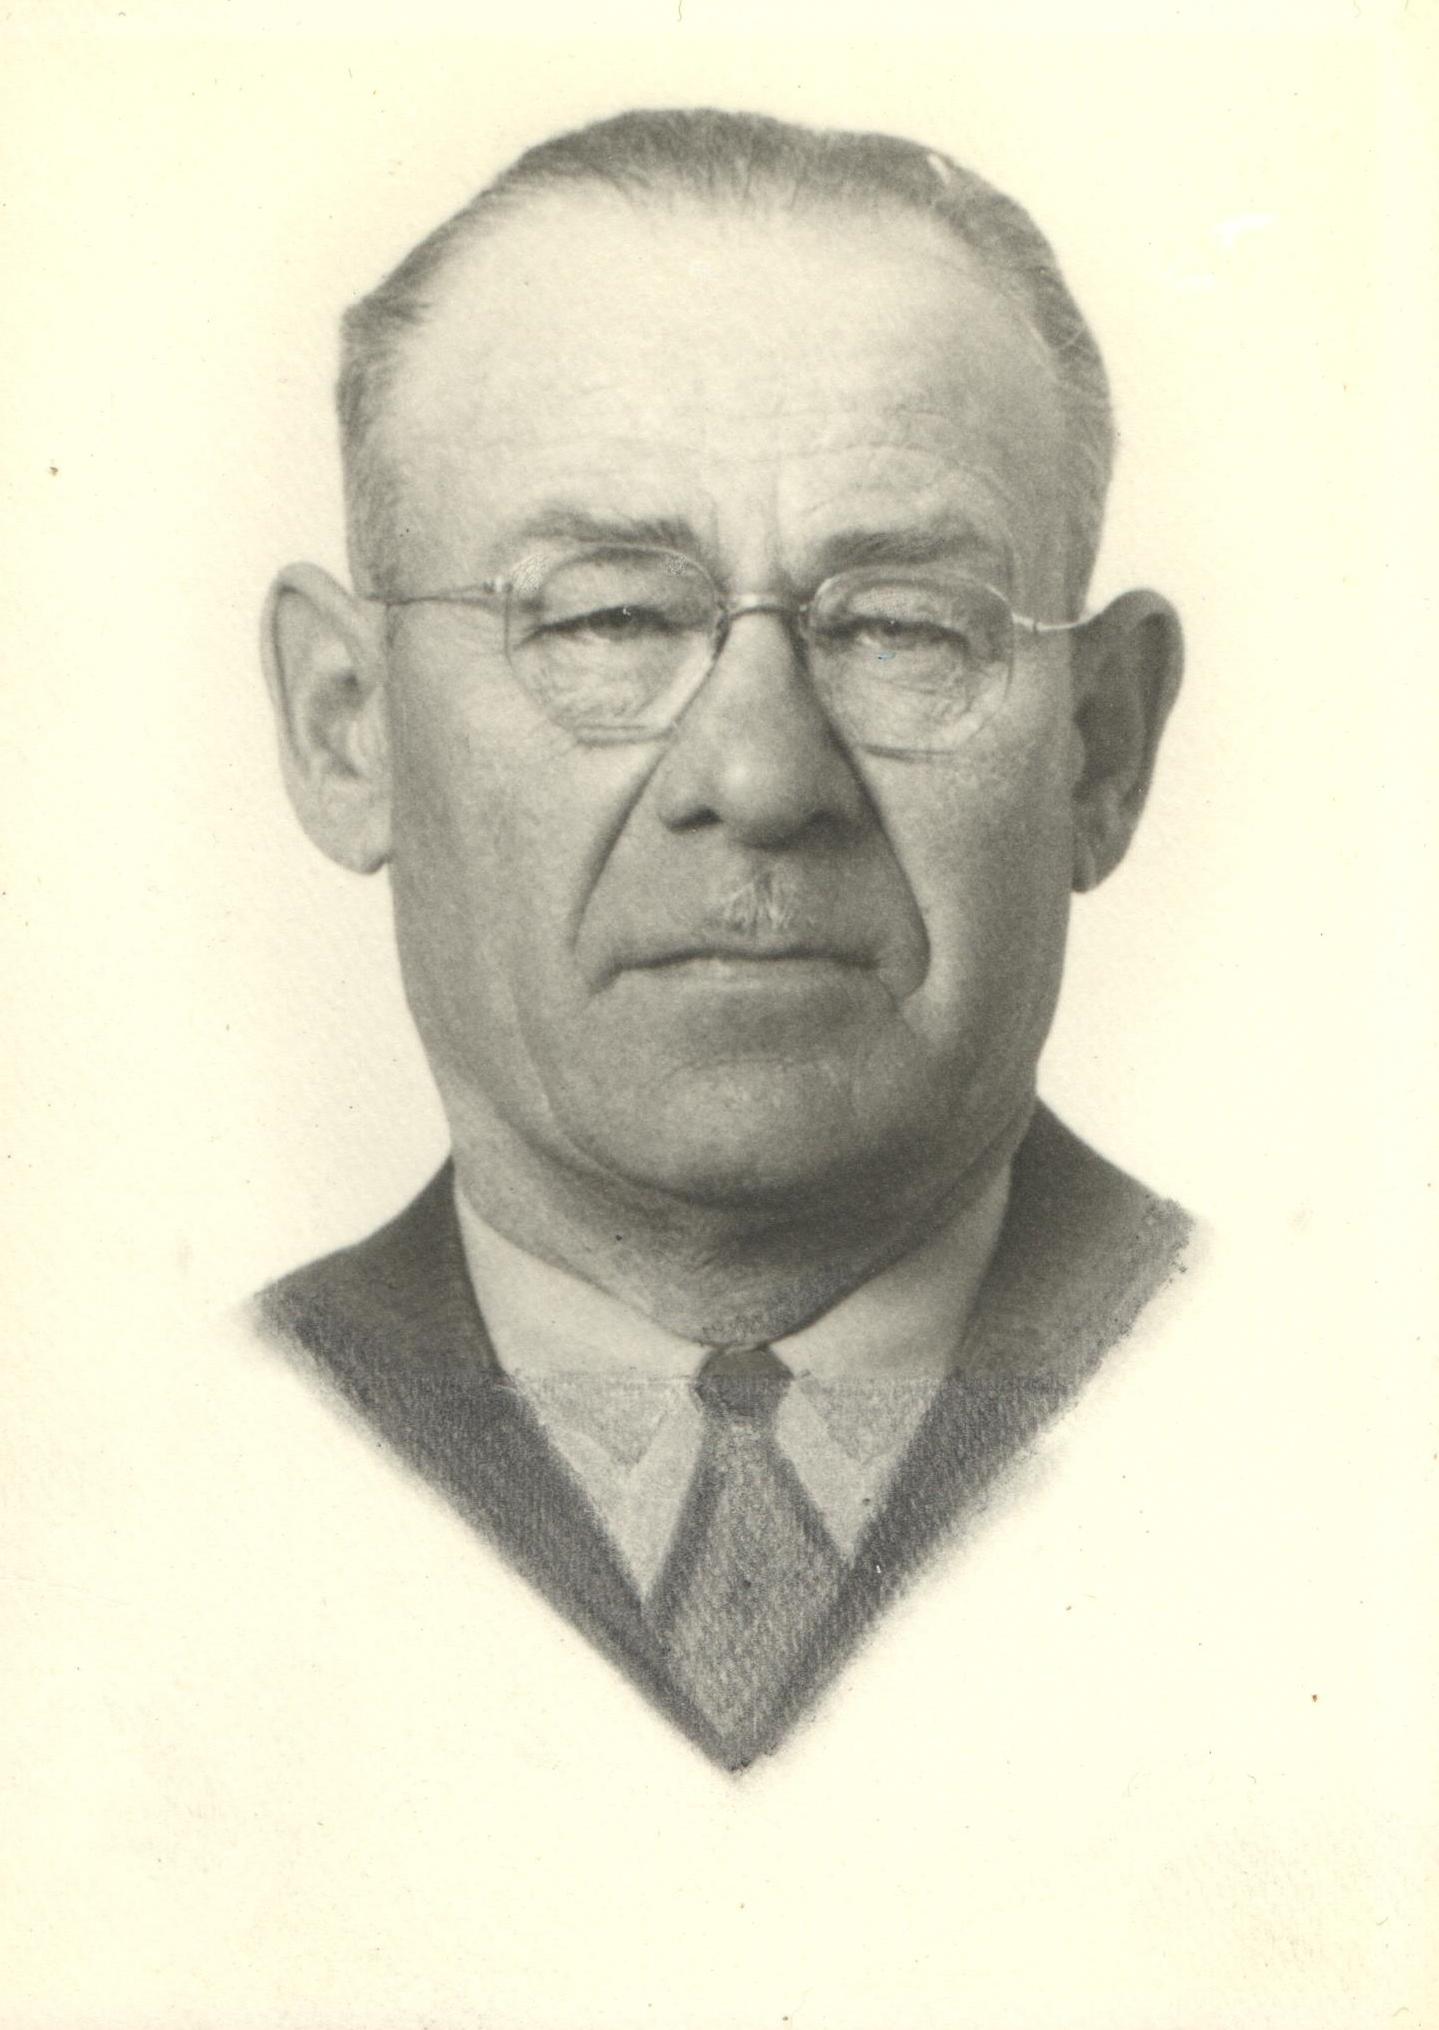 1929 C. J. Johnson